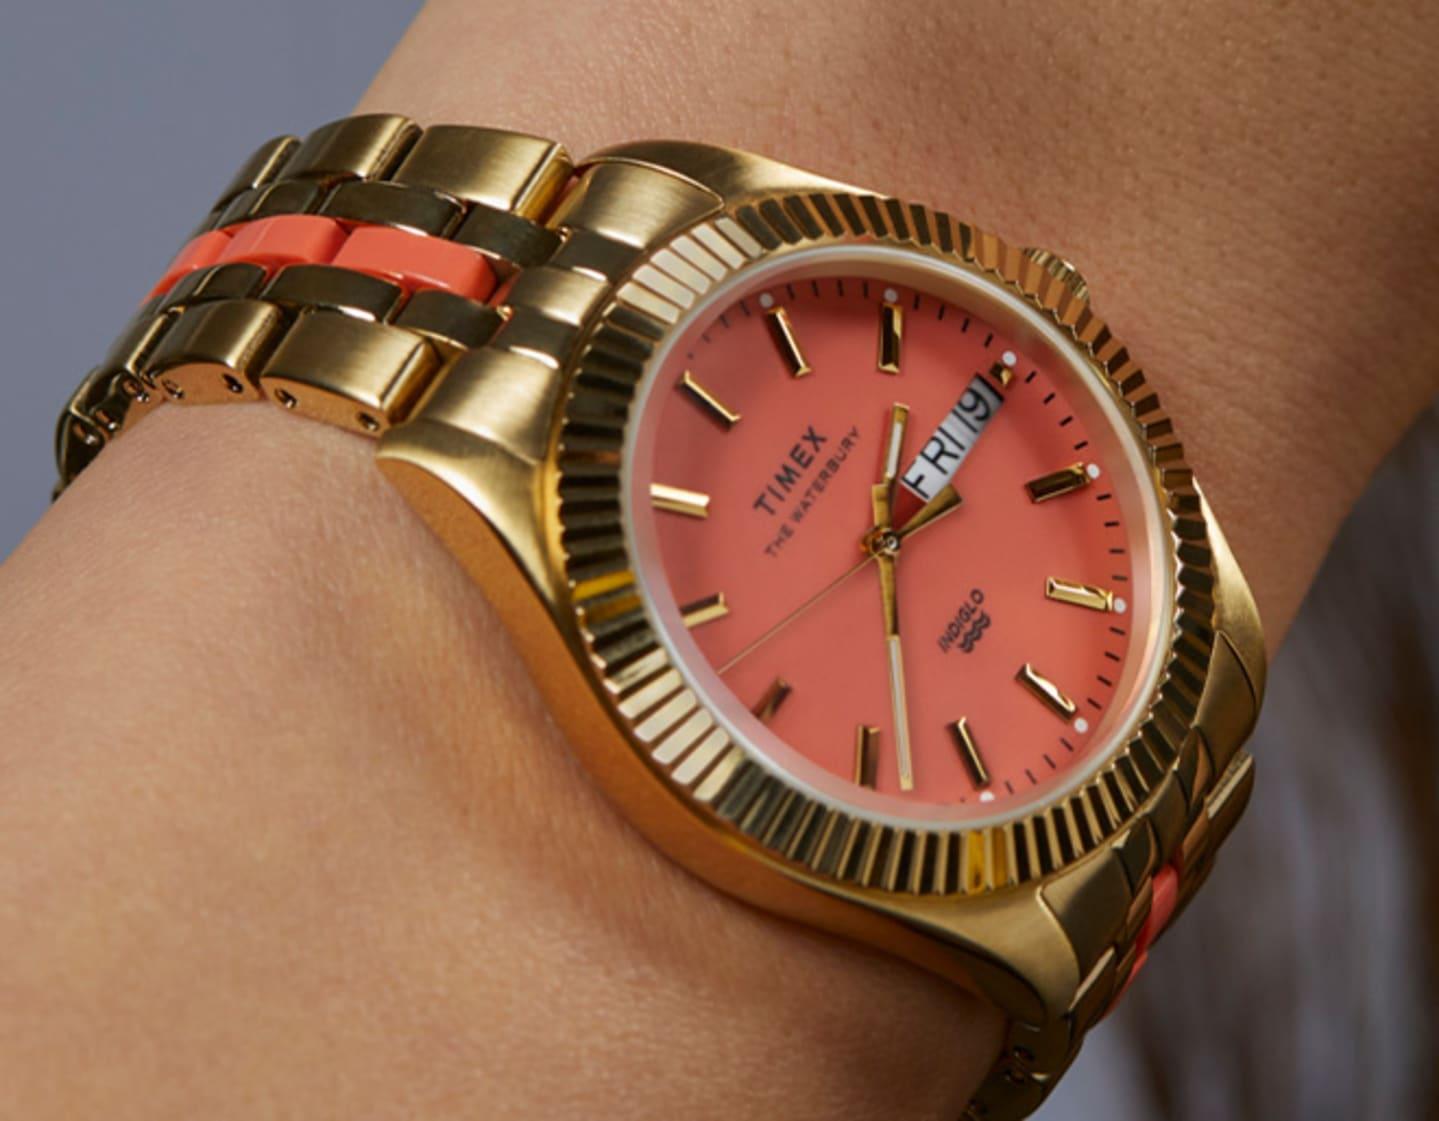 Frau mit Milano Uhr.